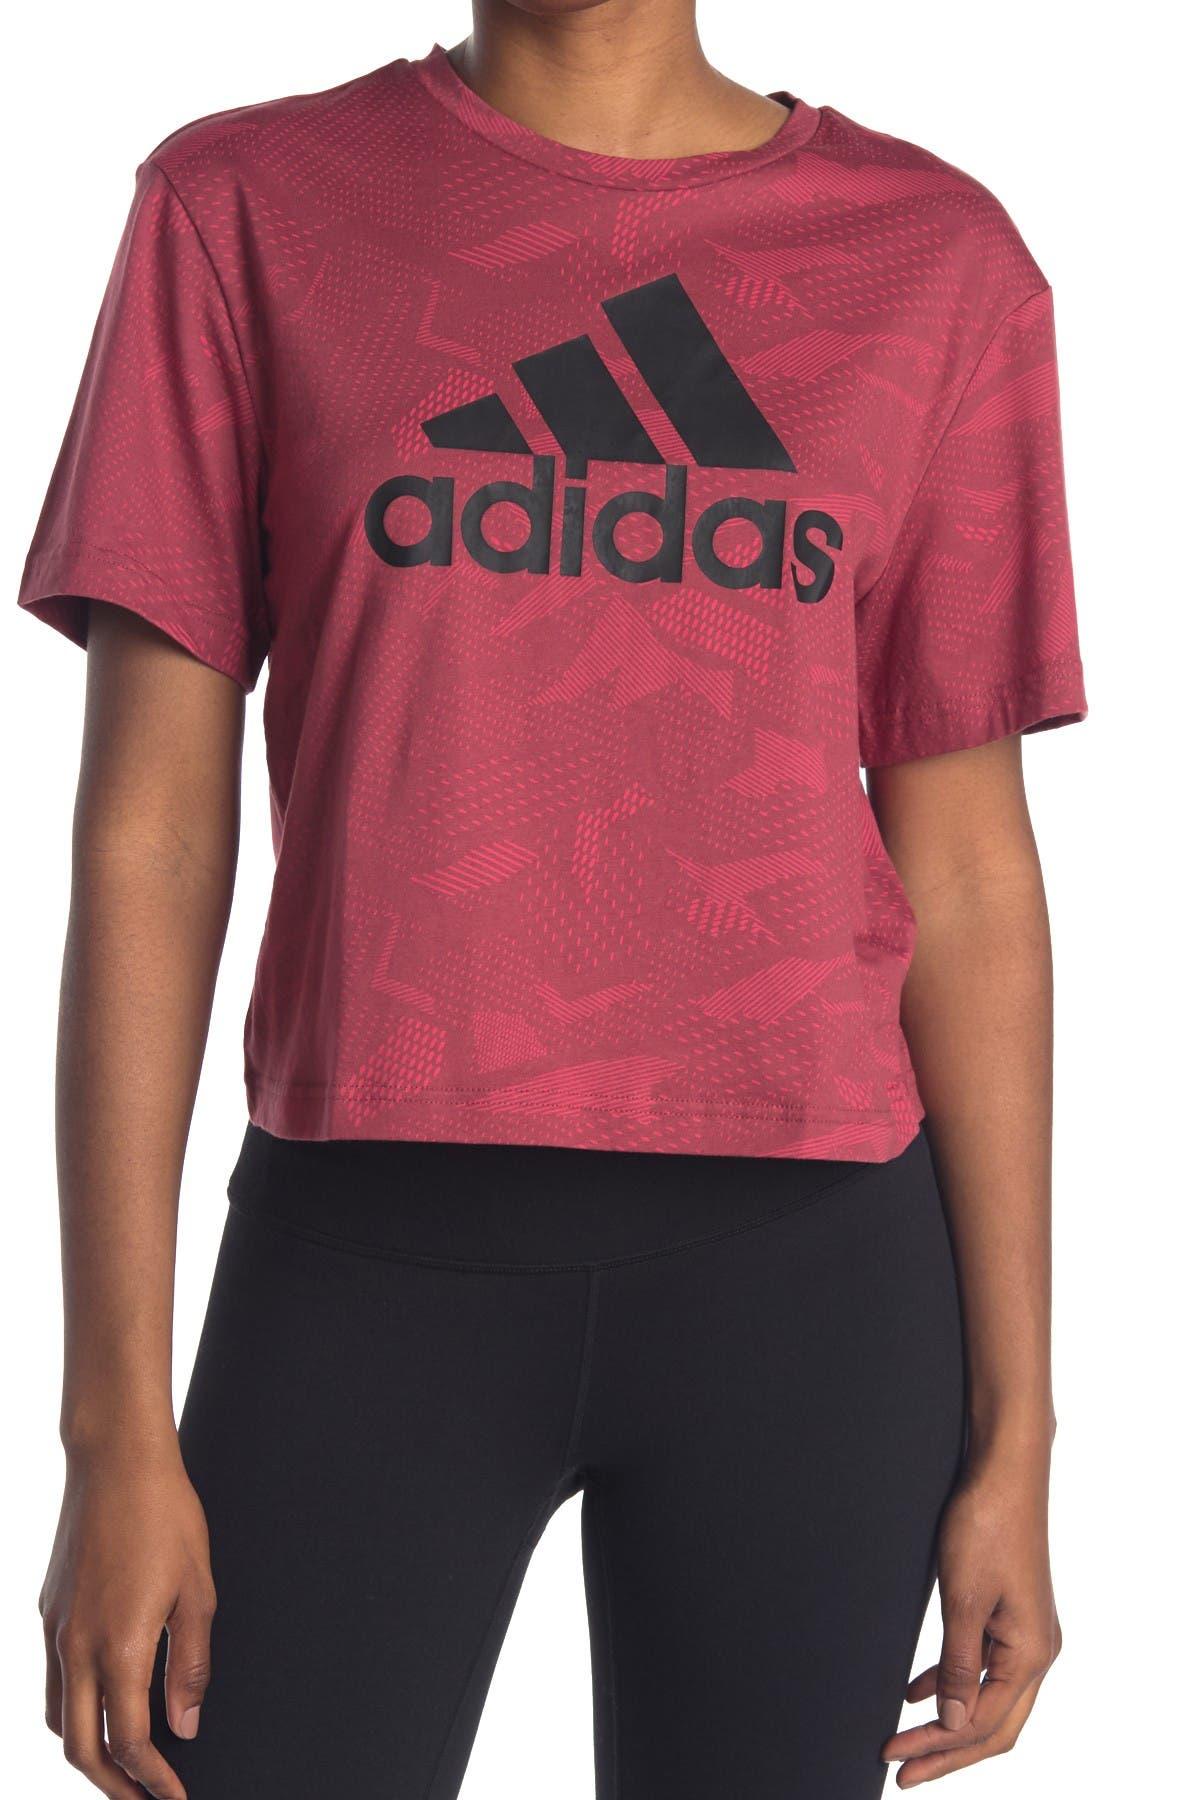 Image of adidas Cropped Logo Tee